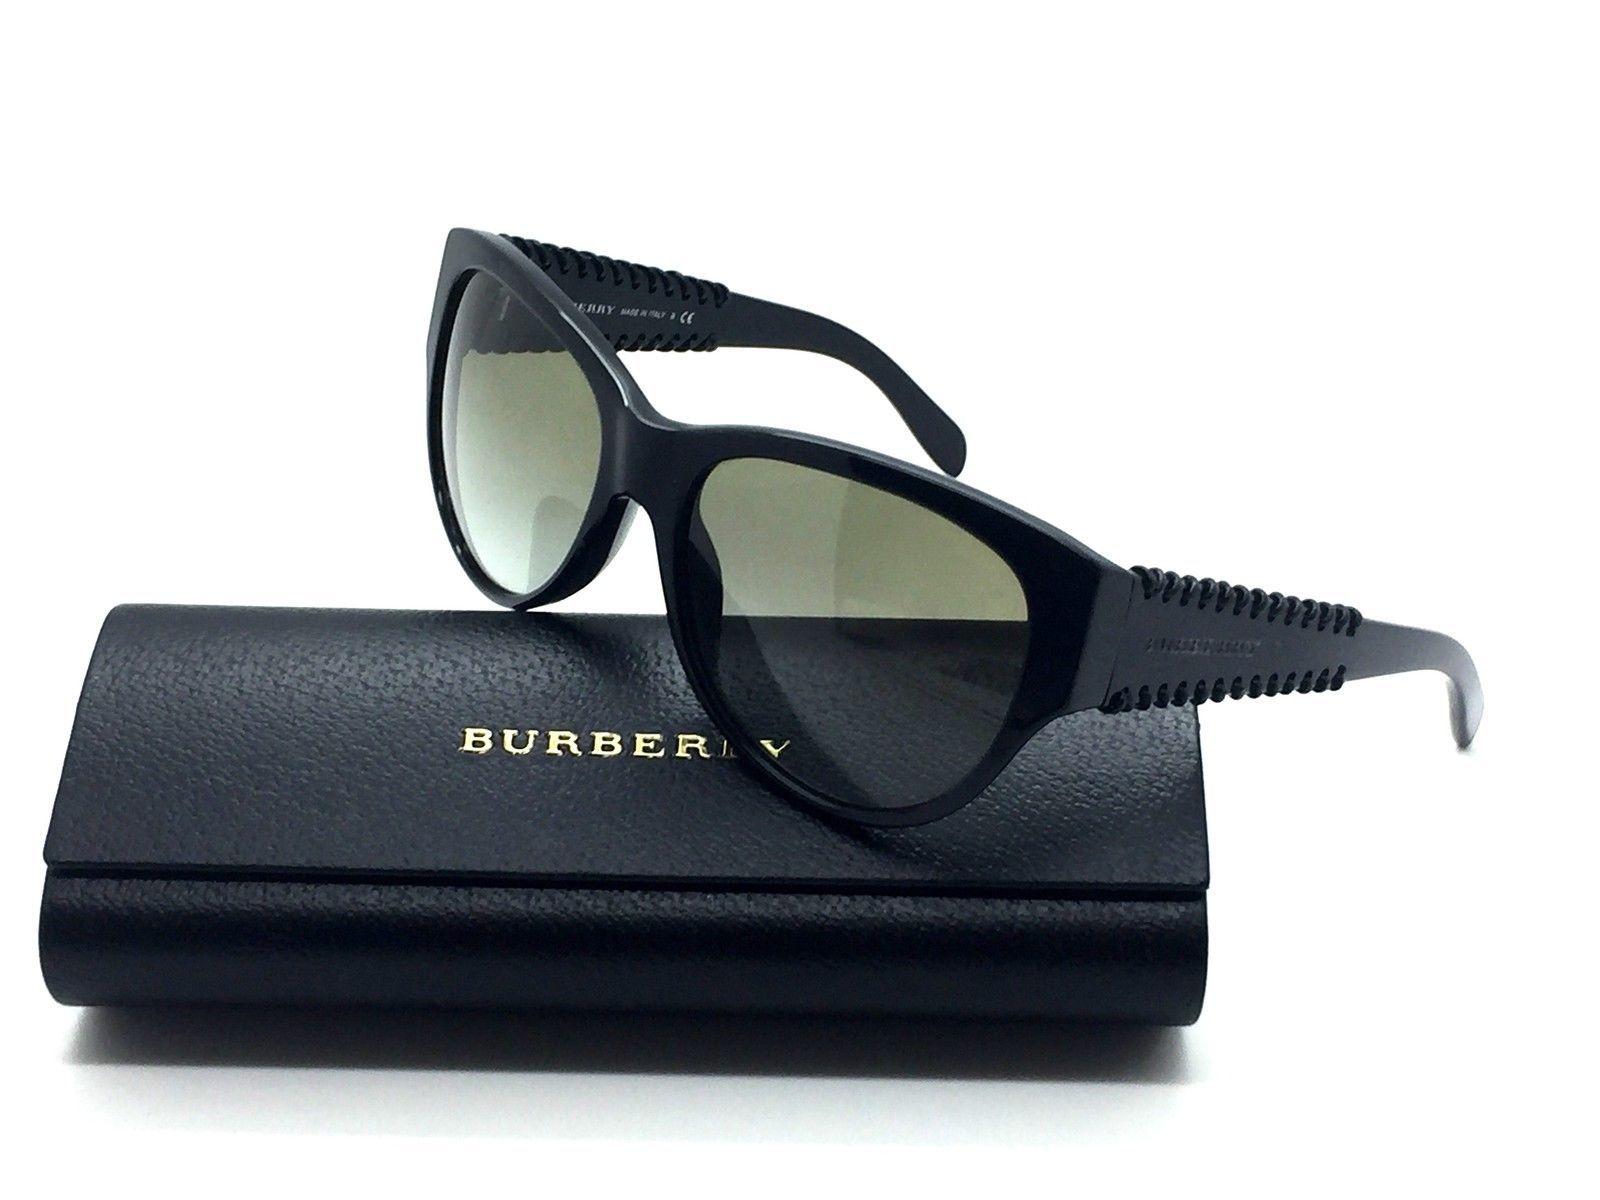 43e24780bbb2 Burberry Burgundy Sunglasses B 4084 3196 13 and 49 similar items